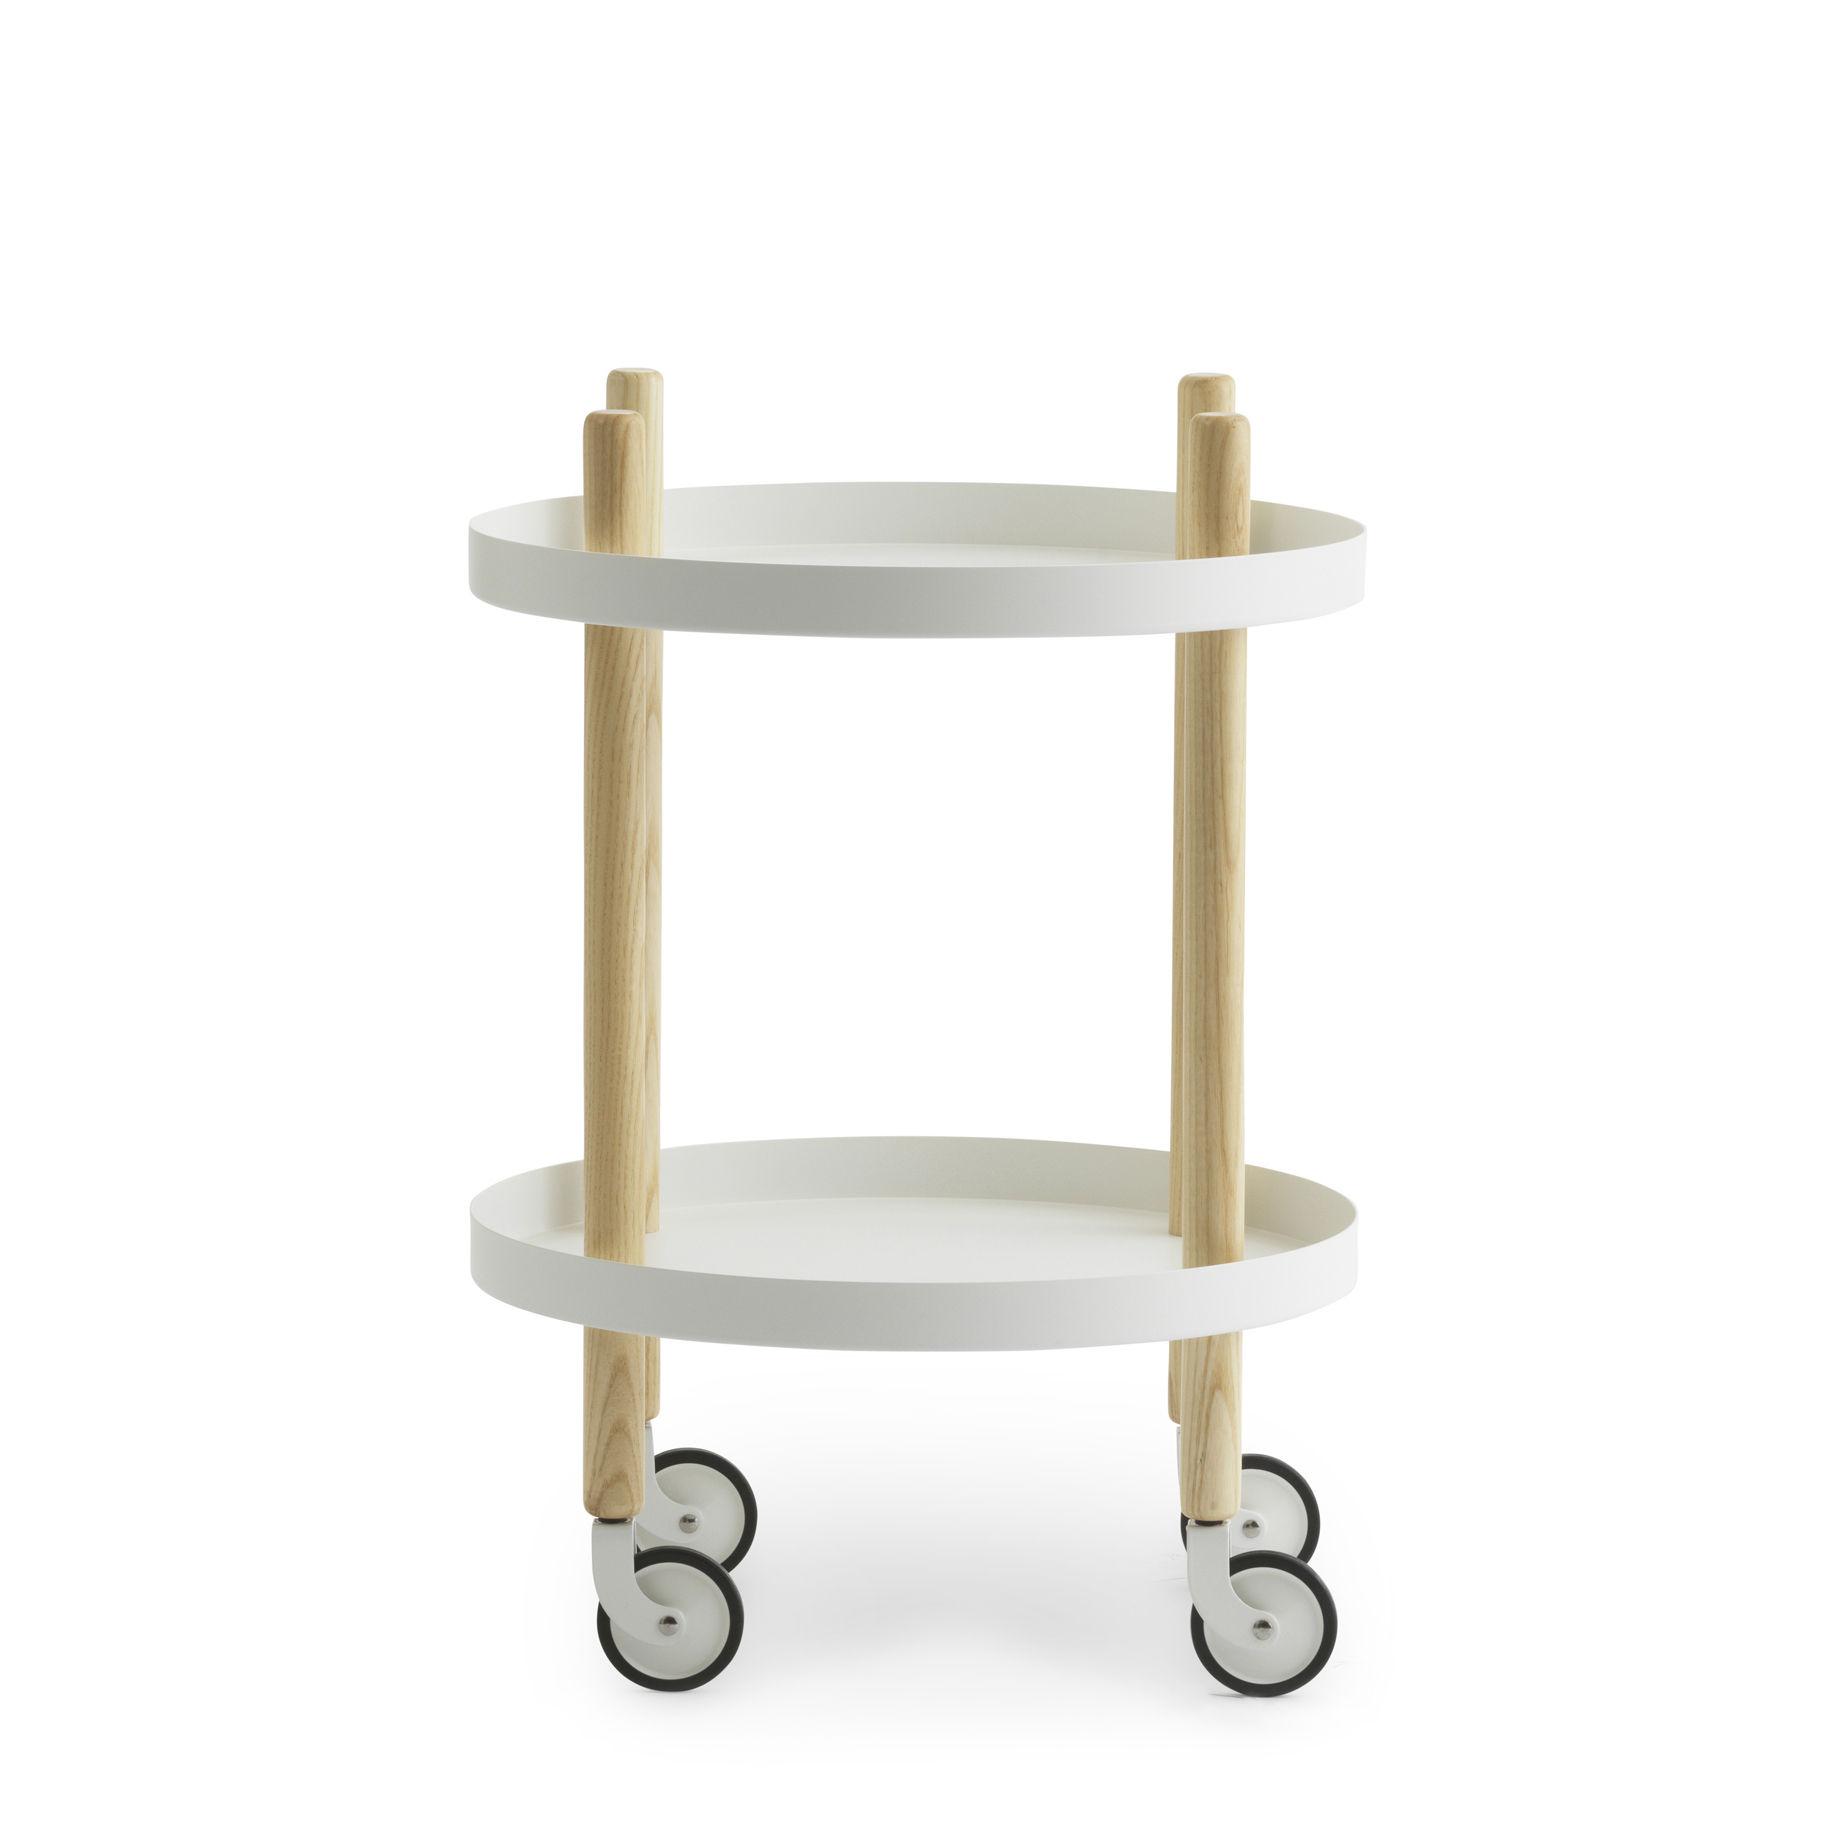 Furniture - Miscellaneous furniture - Block Dresser - / Ø 45 cm by Normann Copenhagen - White - Ashwood, Steel